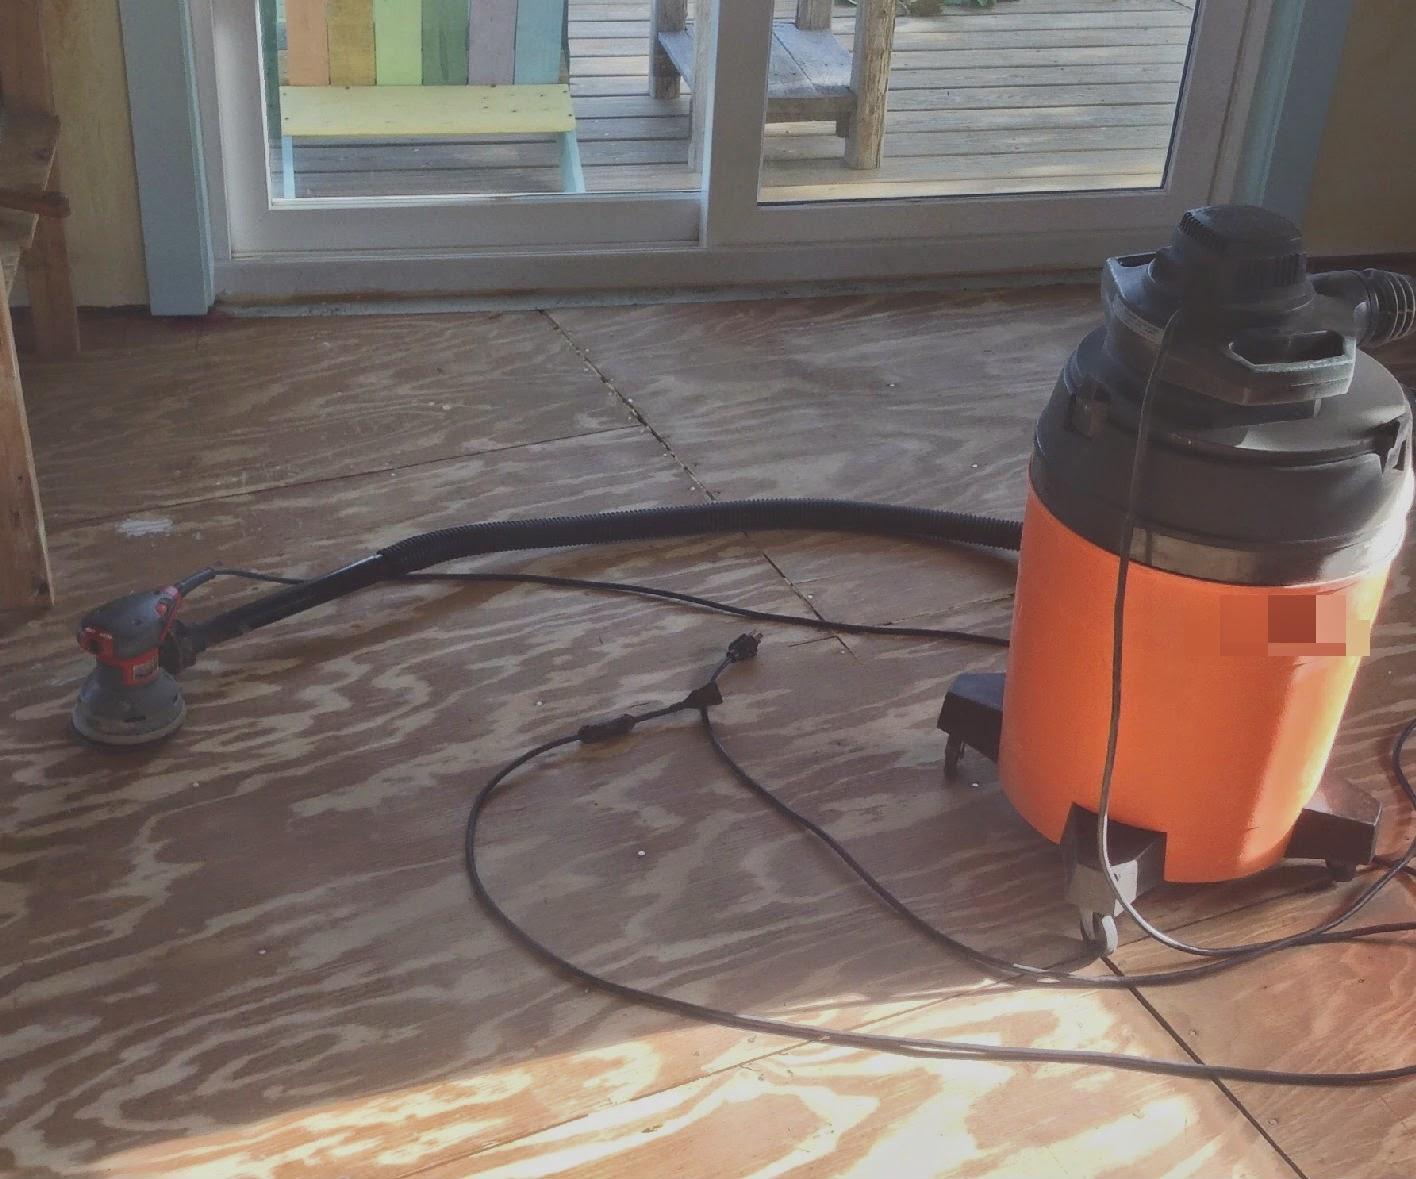 Shop Vac Hack - adding water filtration | Build and Rebuild, Island